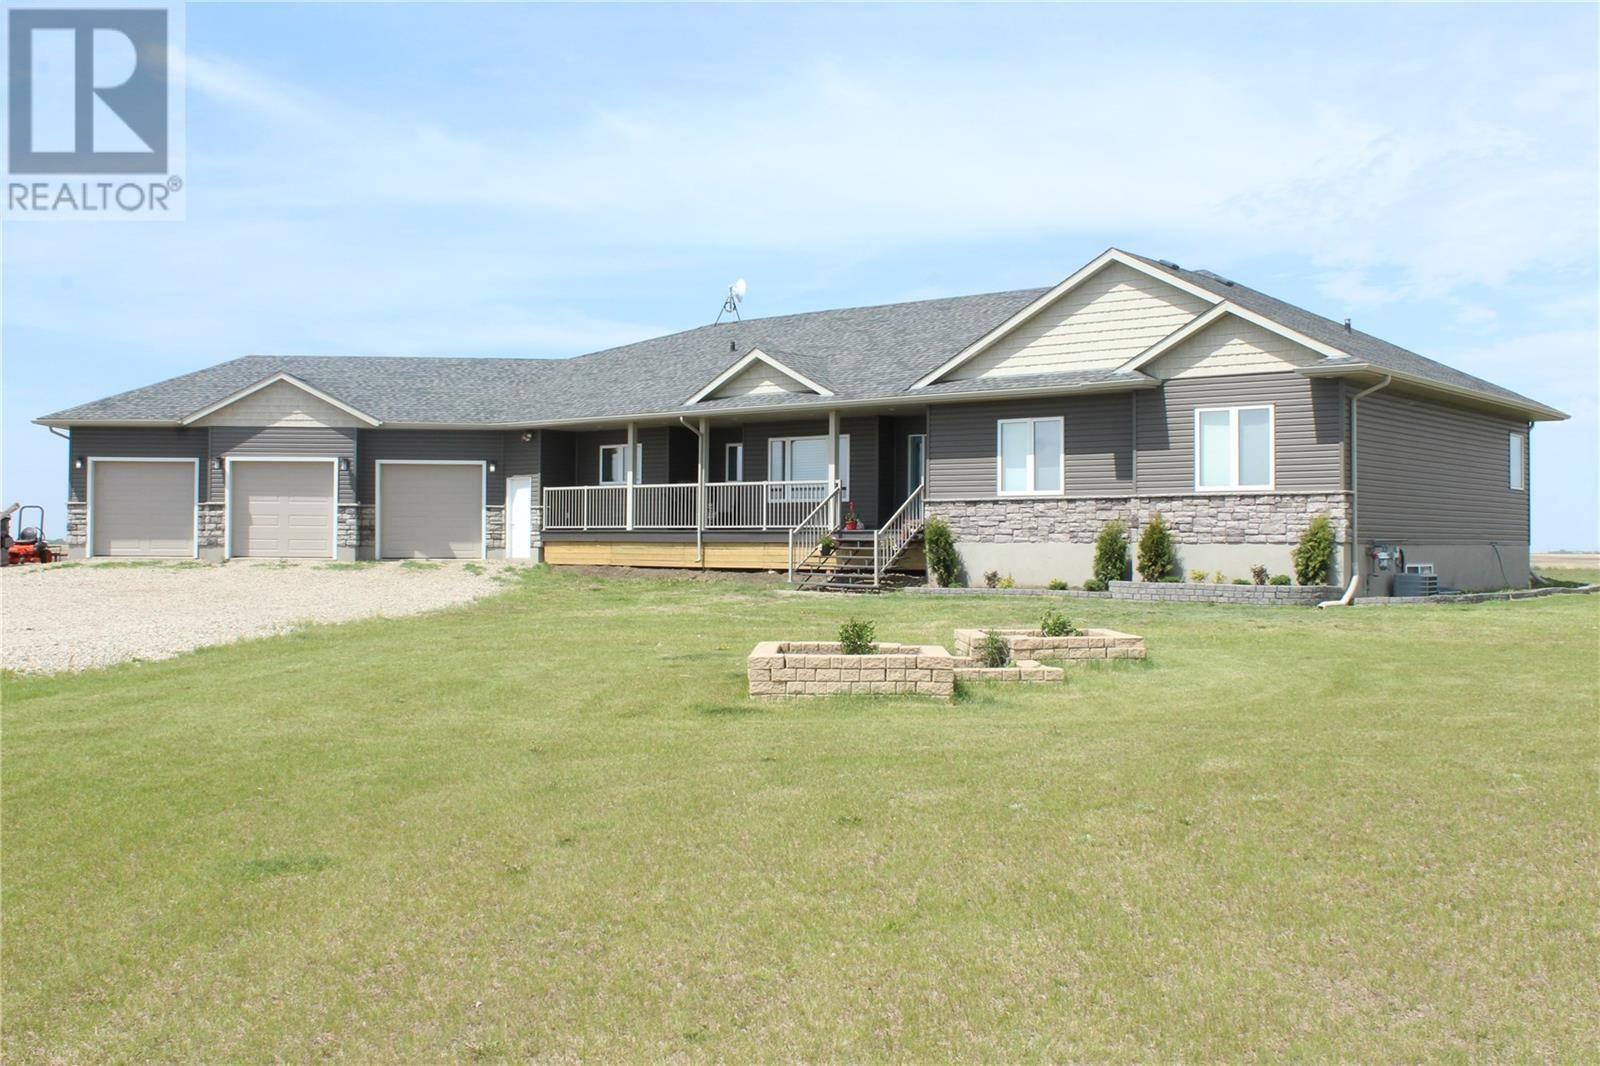 House for sale at  Se-08-03-07 W2  Estevan Rm No. 5 Saskatchewan - MLS: SK774621